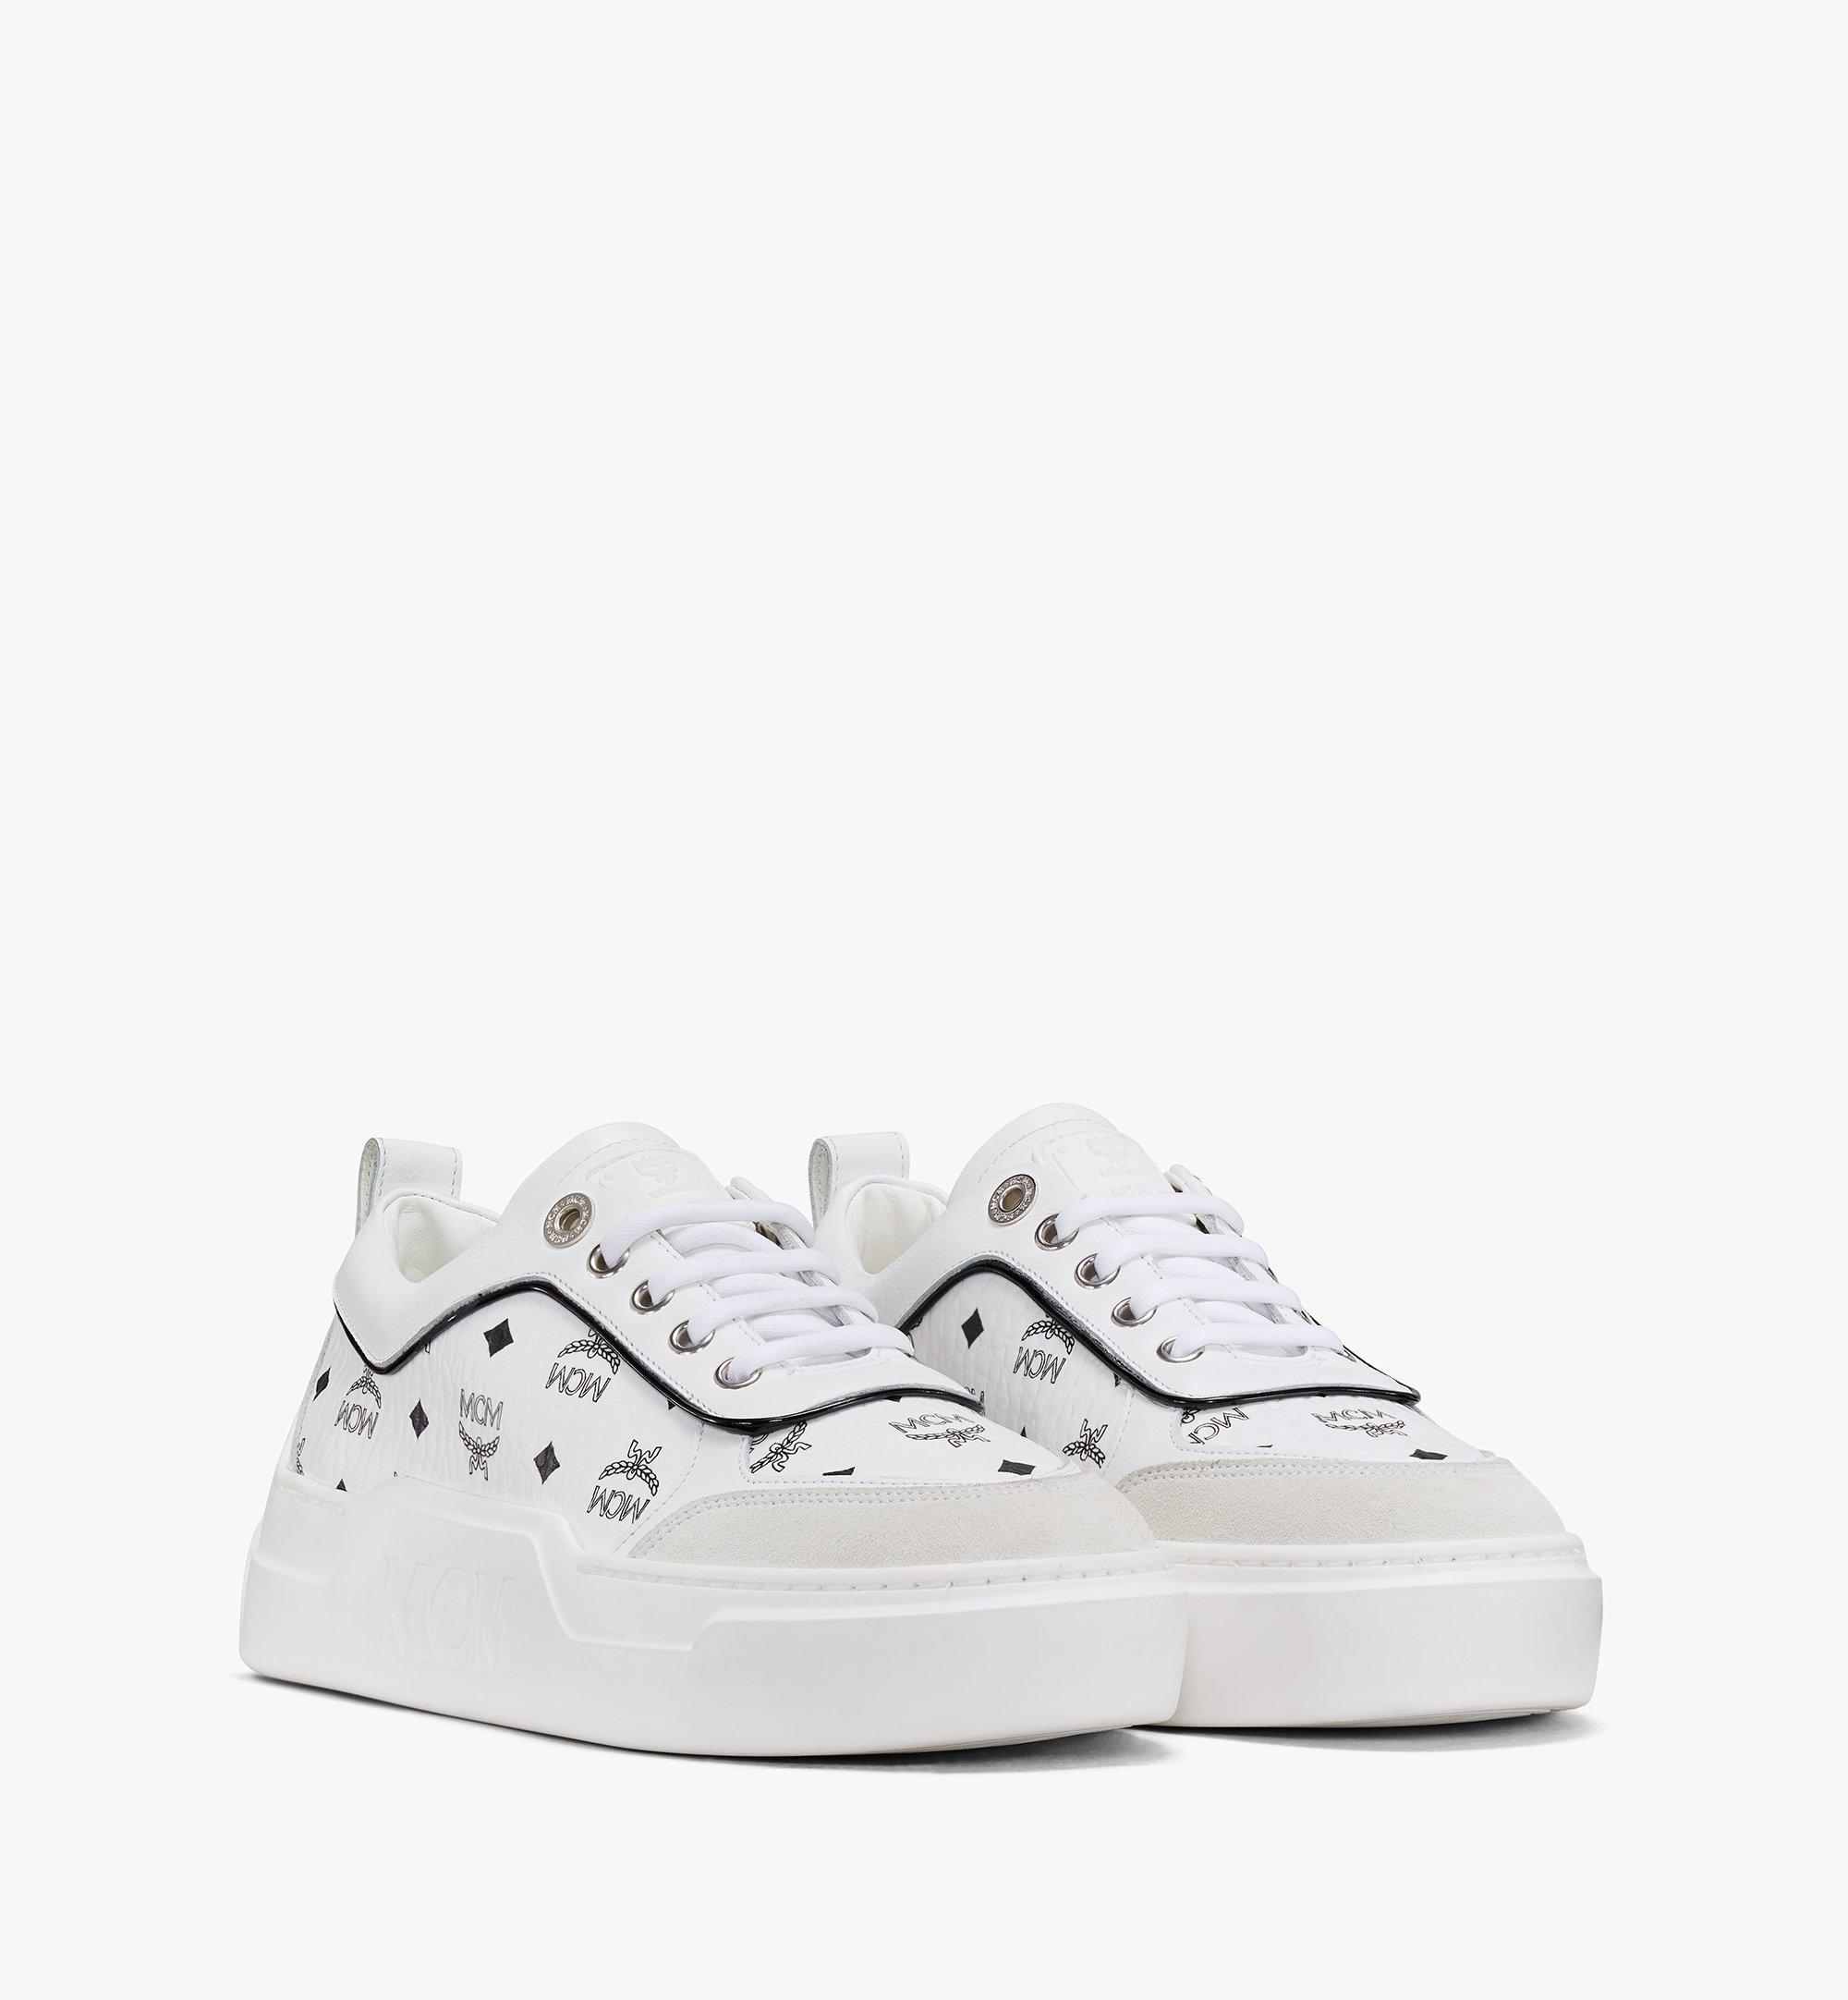 MCM Women's Skyward Platform Sneakers in Visetos White MESAAMM19WT037 Alternate View 1